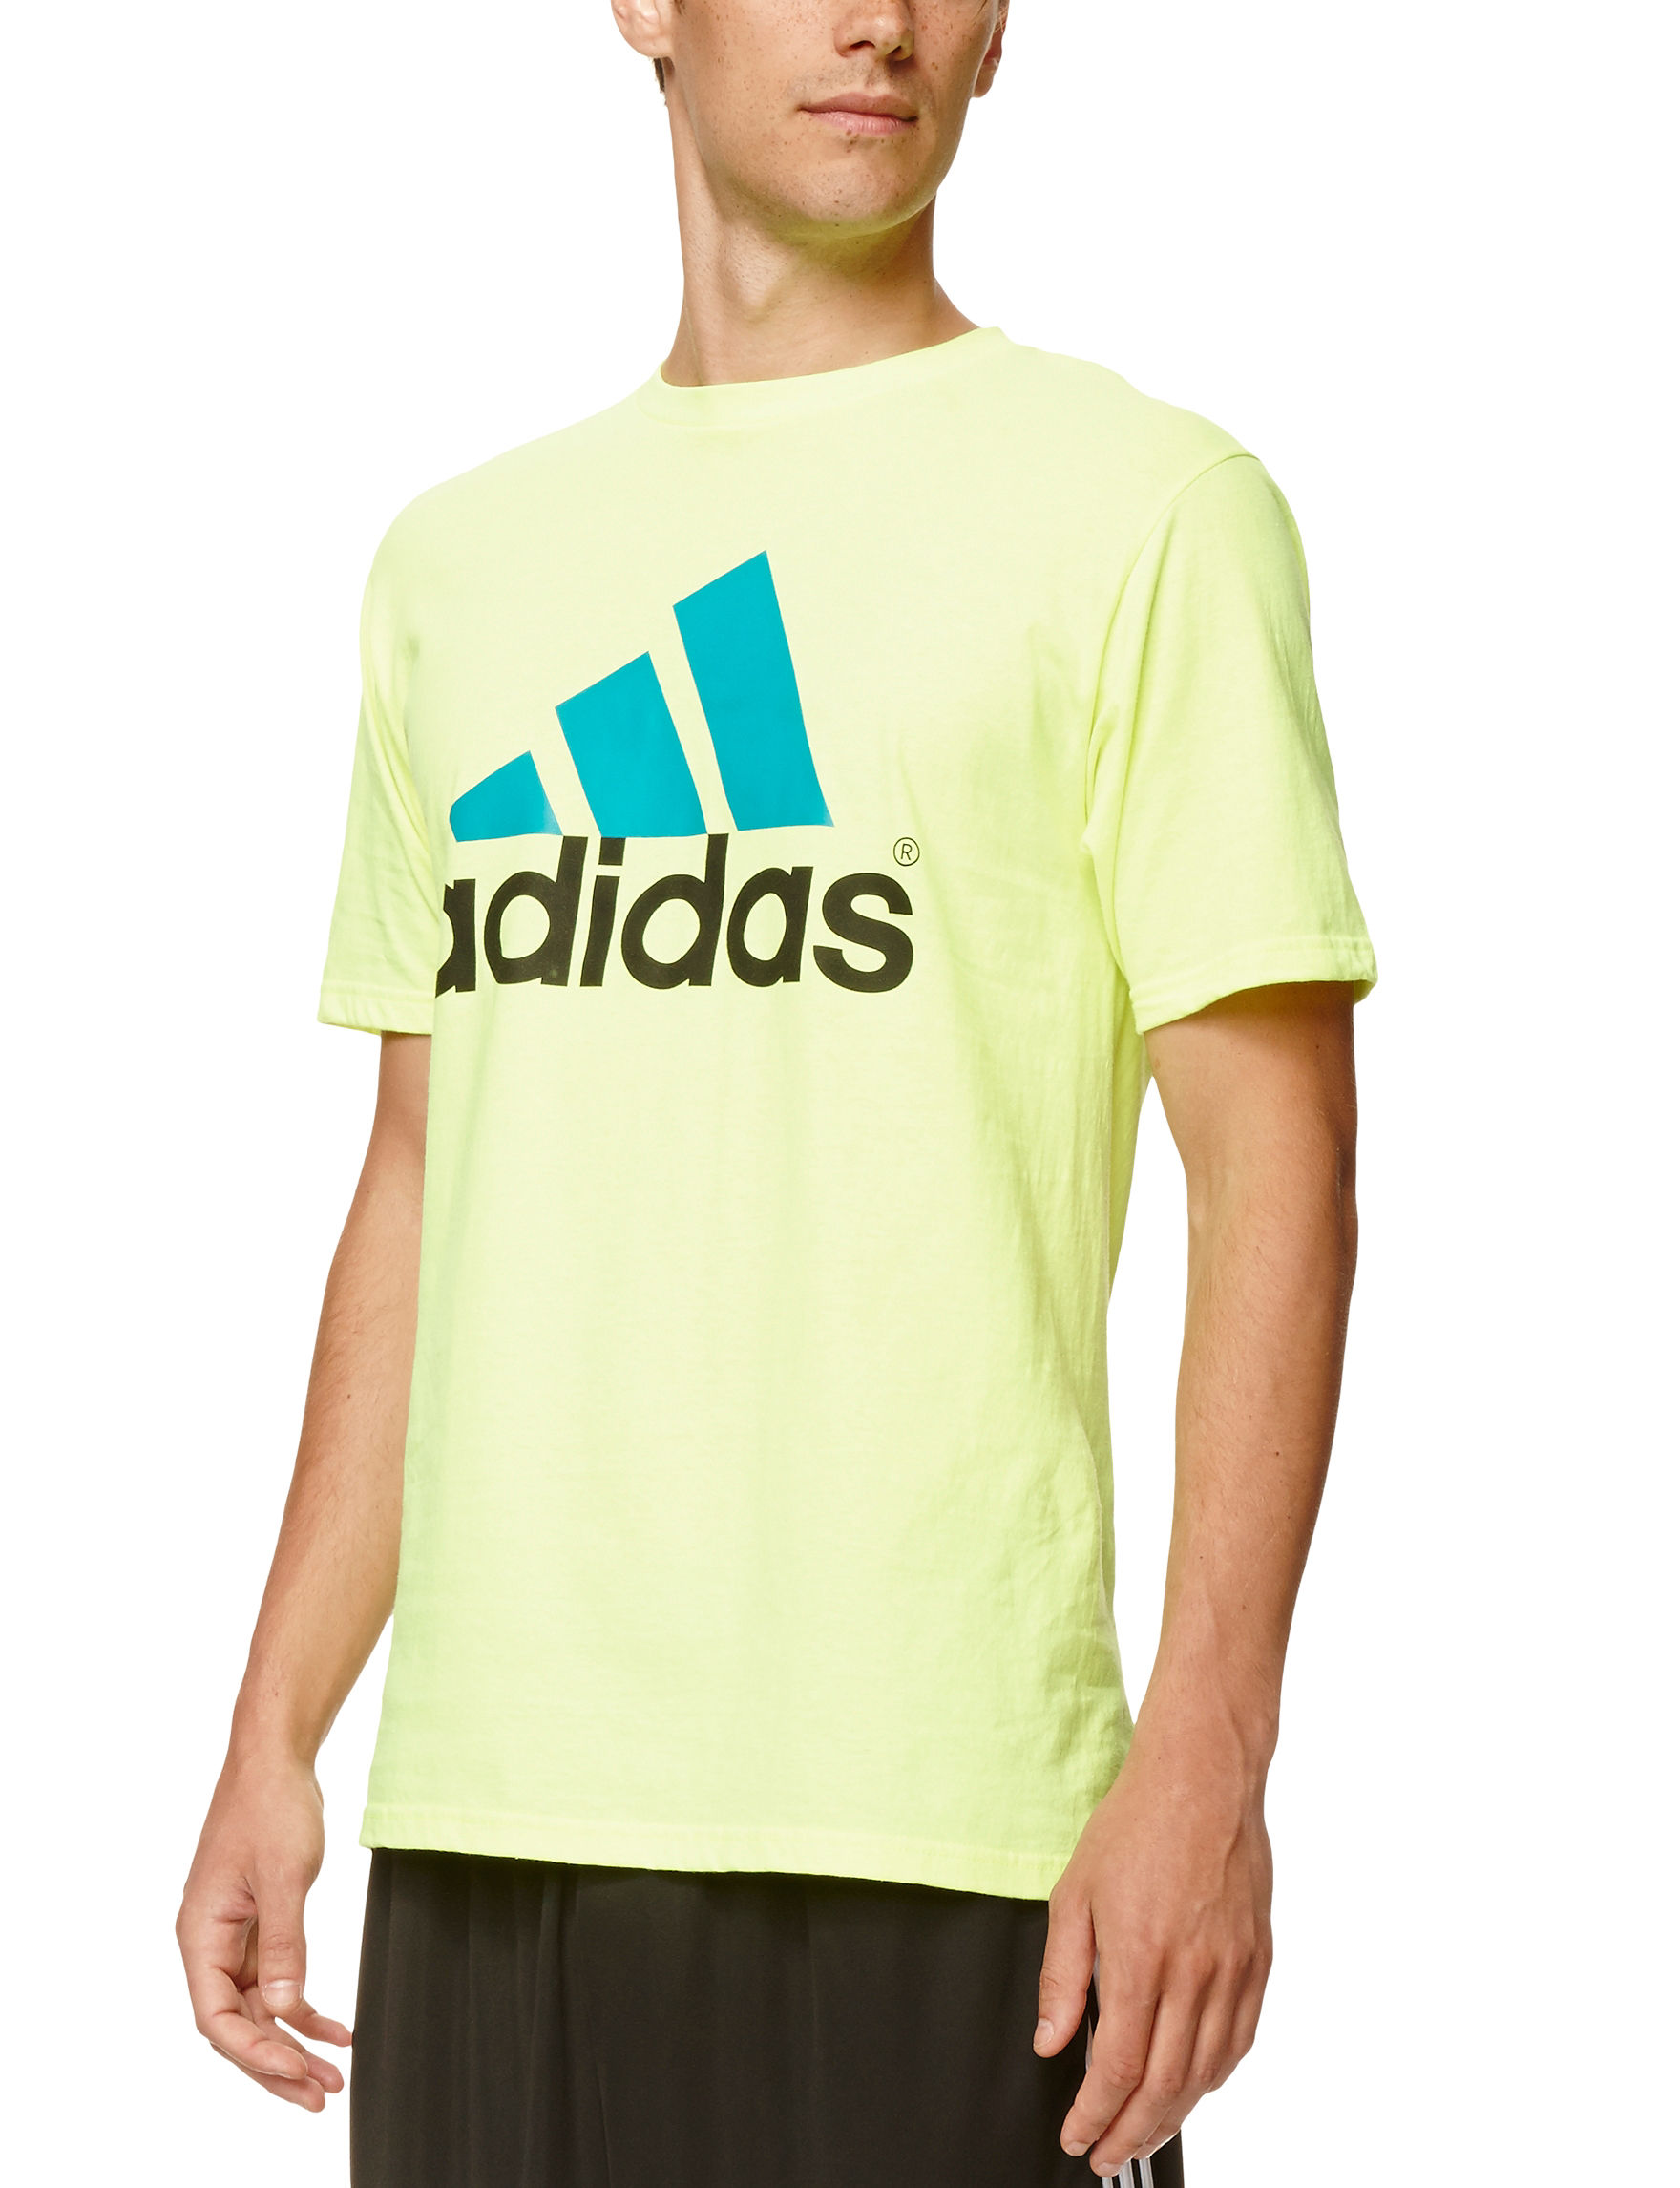 Adidas Yellow Tees & Tanks